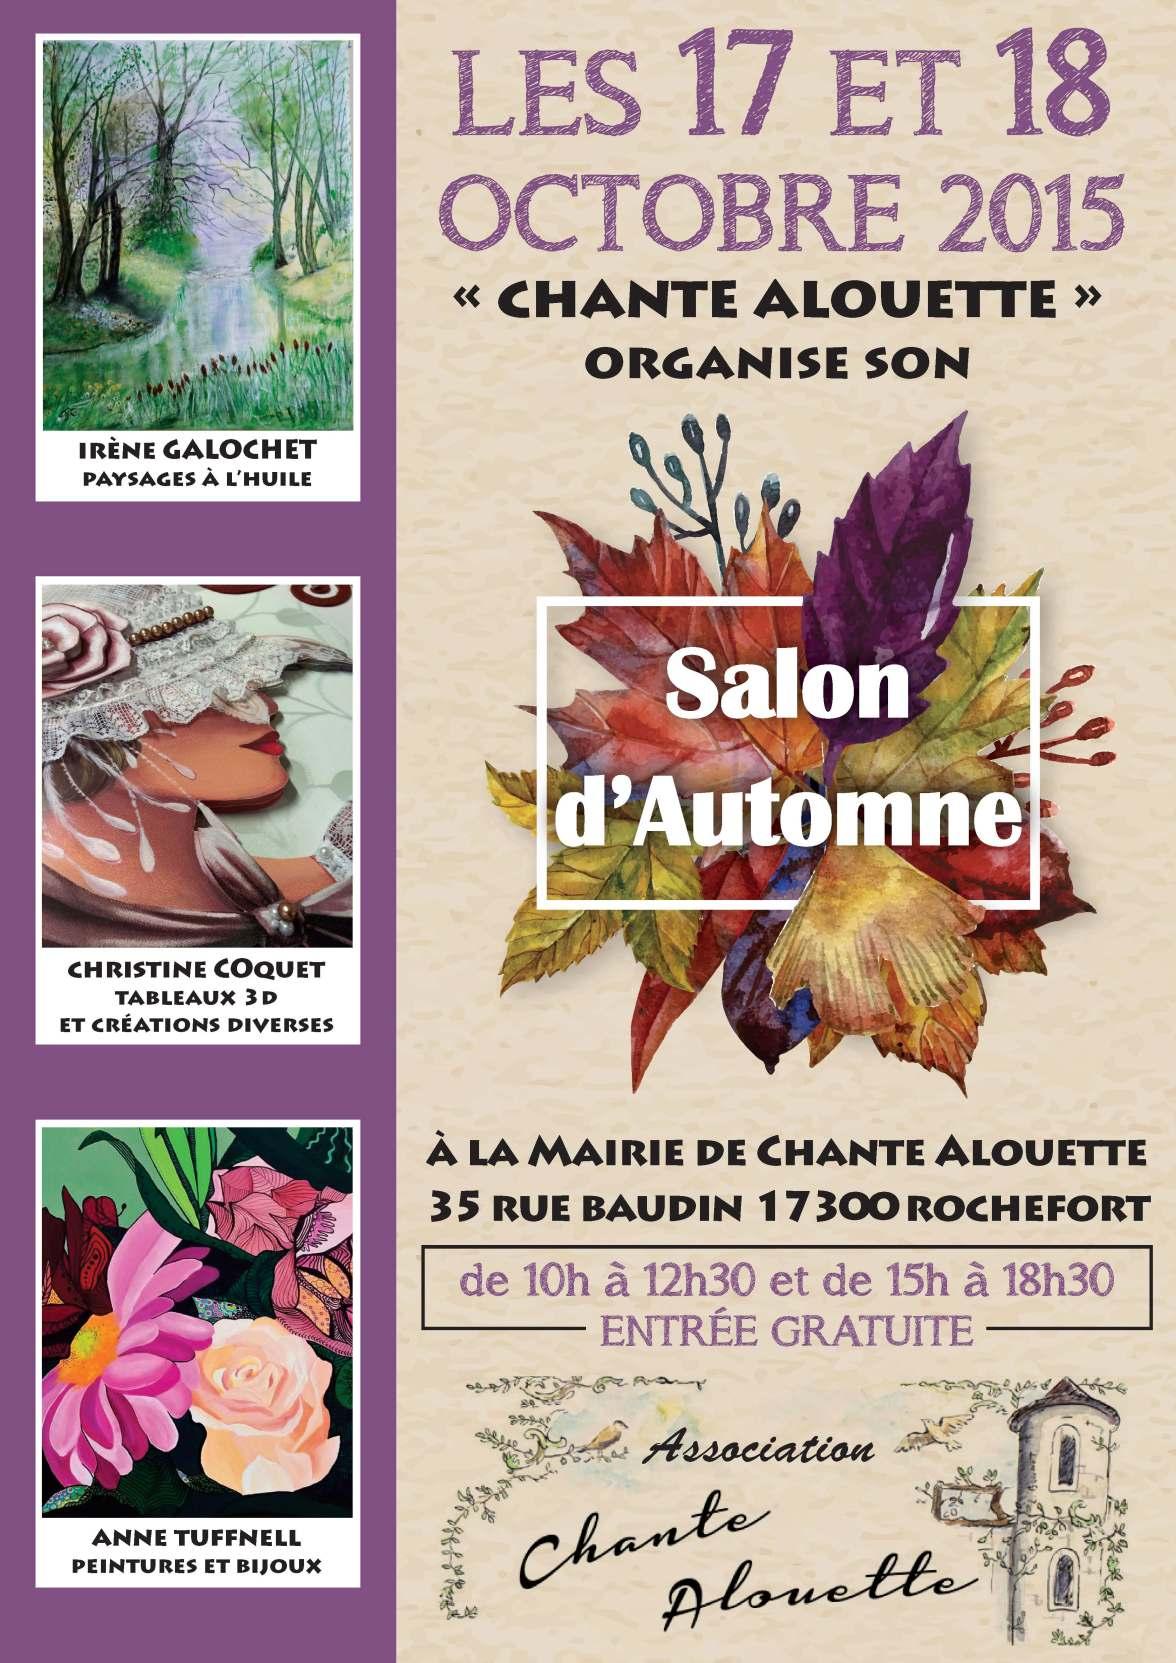 SalonAutomne2015-Chante-Alouette-afficheOK